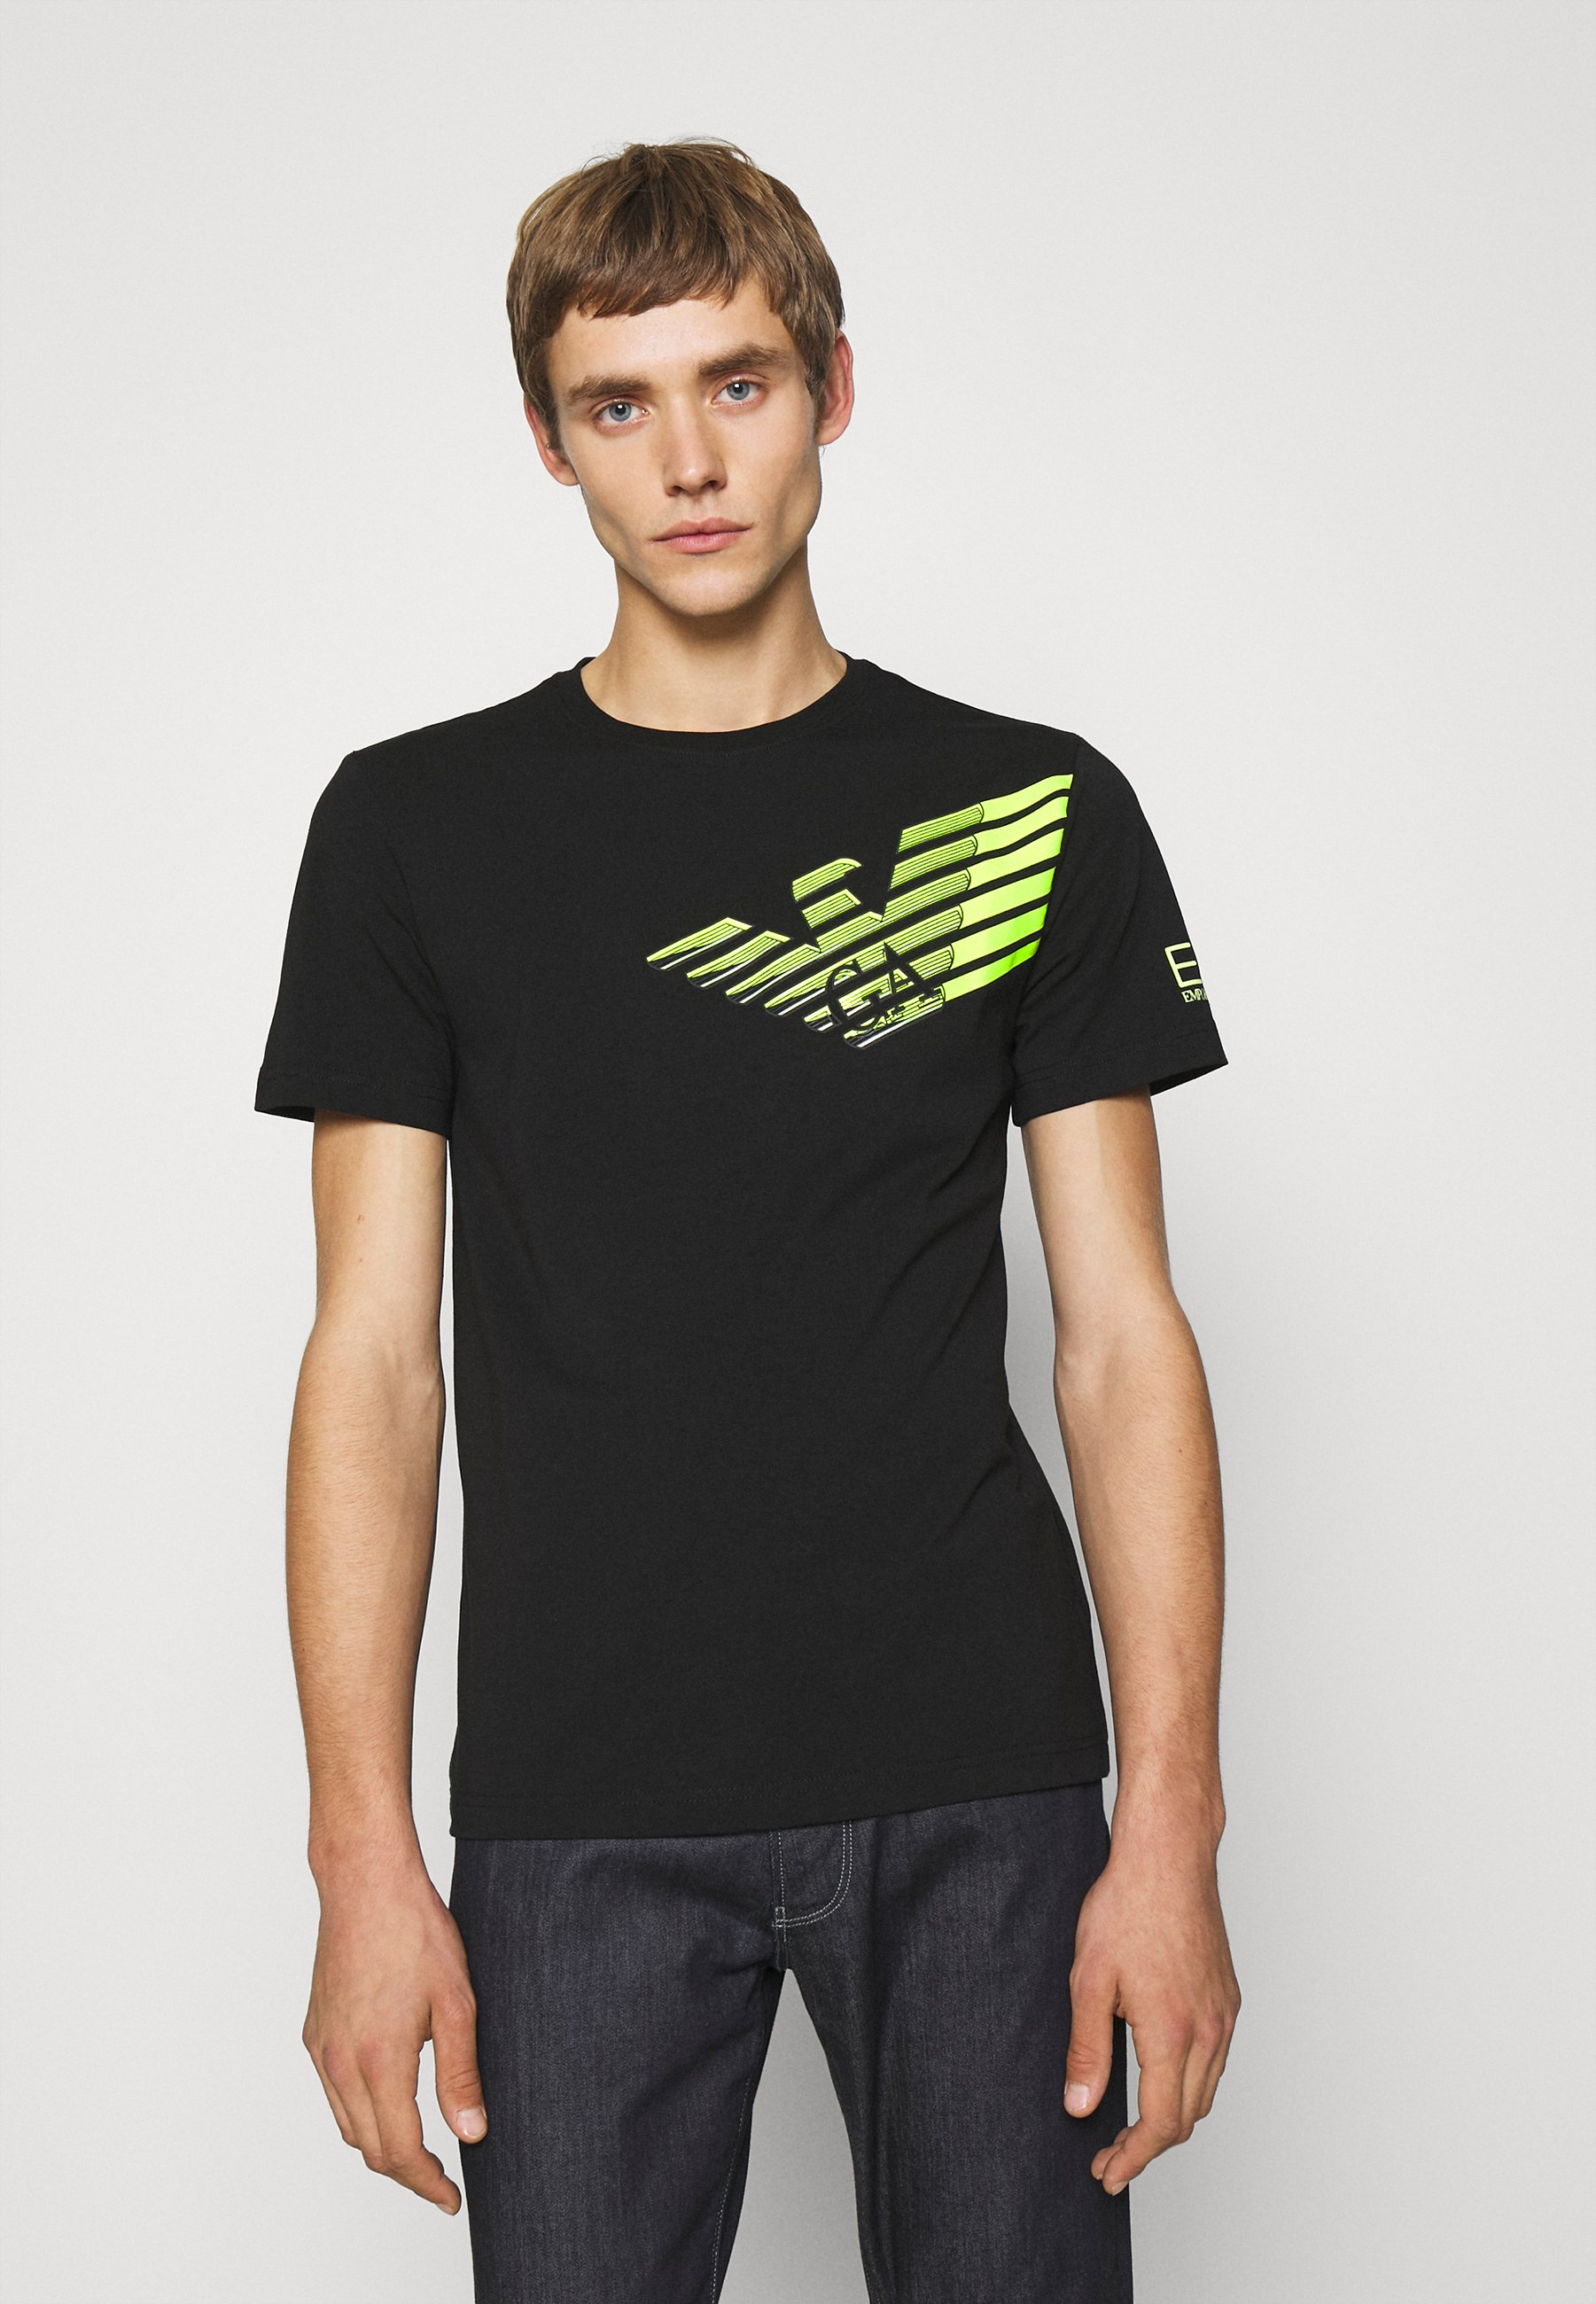 Uomo T-shirt con stampa - black/neon